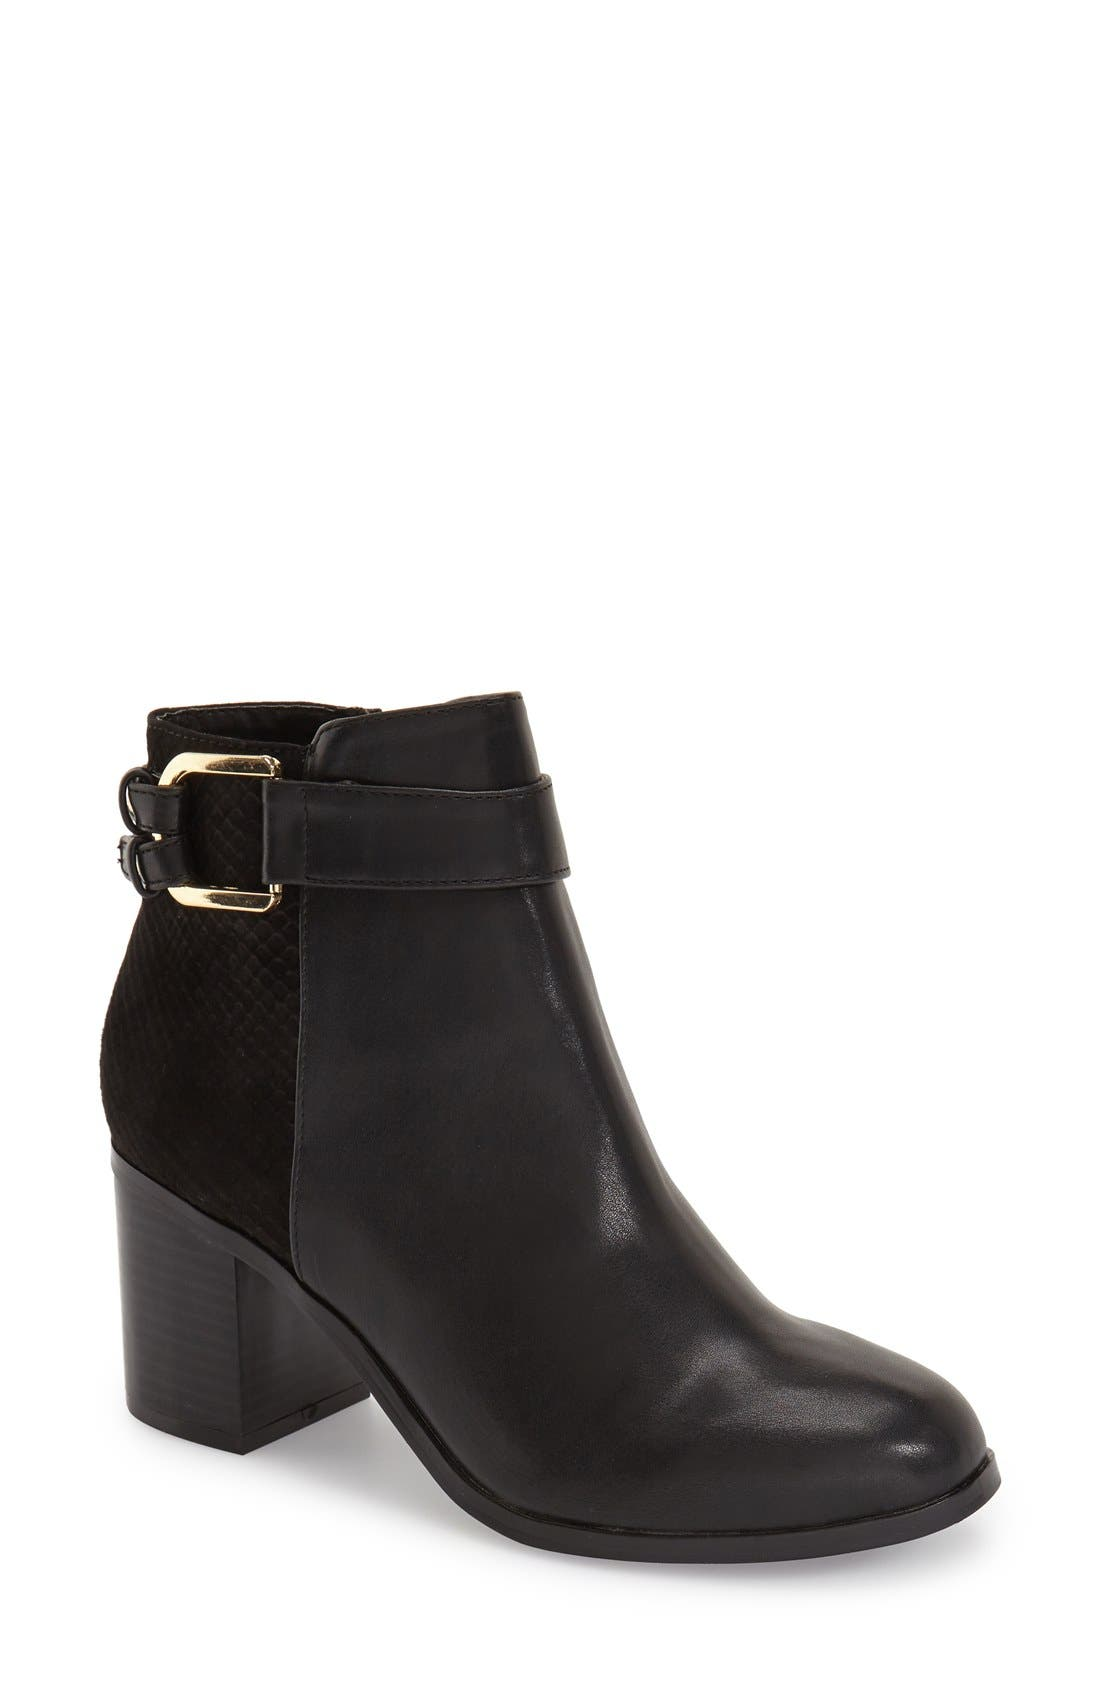 TOPSHOP 'Beam' Boot, Main, color, 001